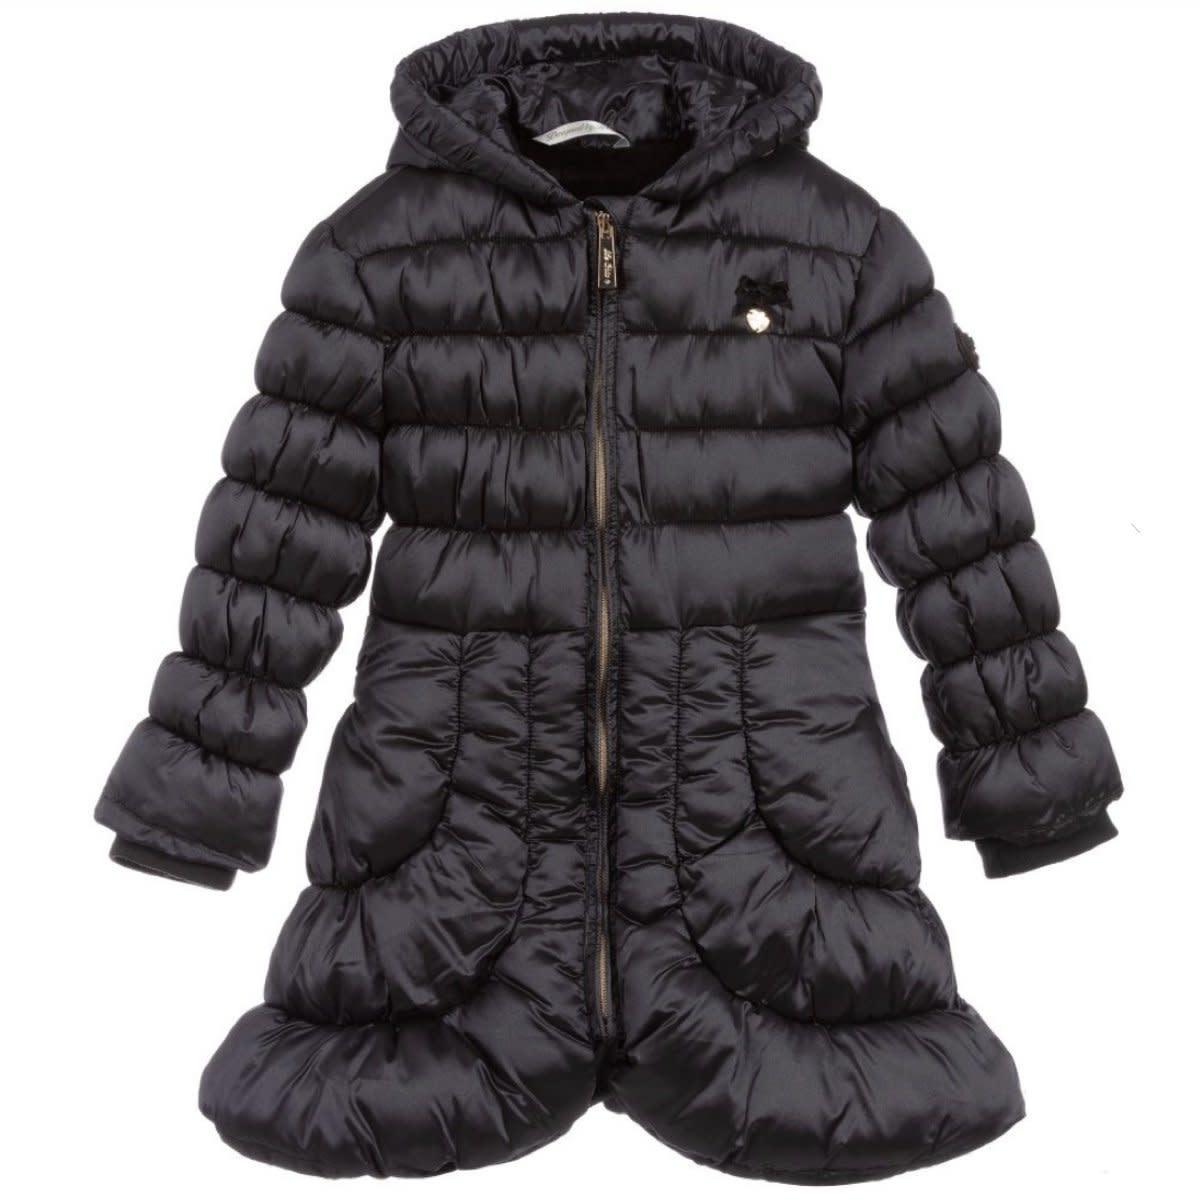 Lechic LeChic C007-5219 Grey Iron Winter Coat